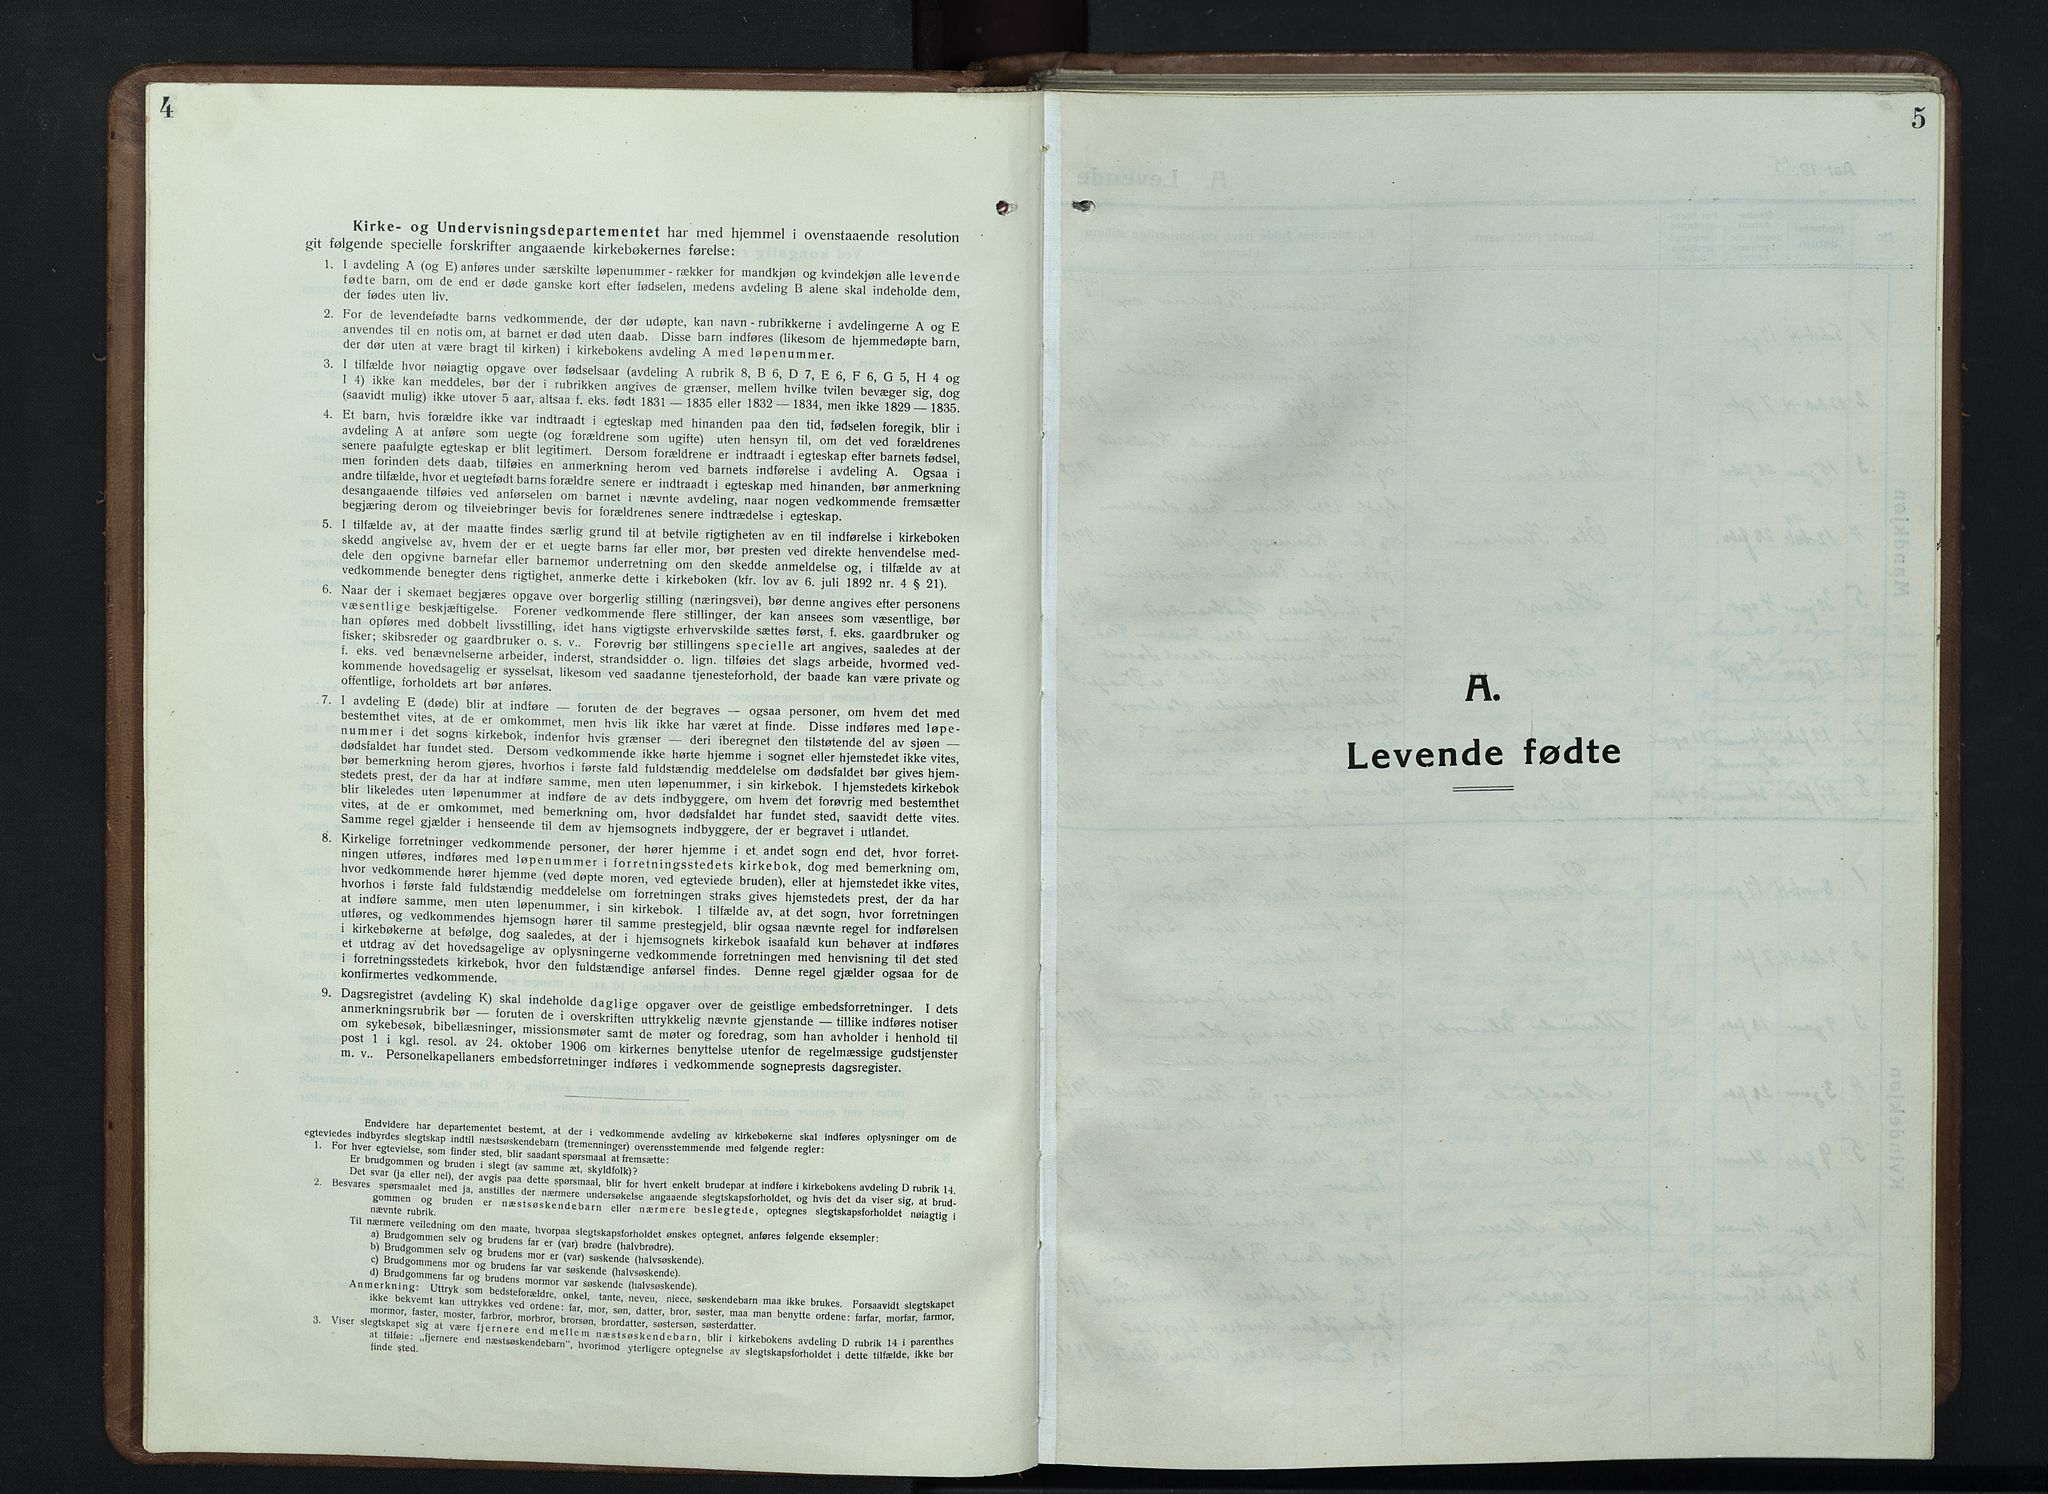 SAH, Nord-Fron prestekontor, Klokkerbok nr. 7, 1915-1946, s. 4-5